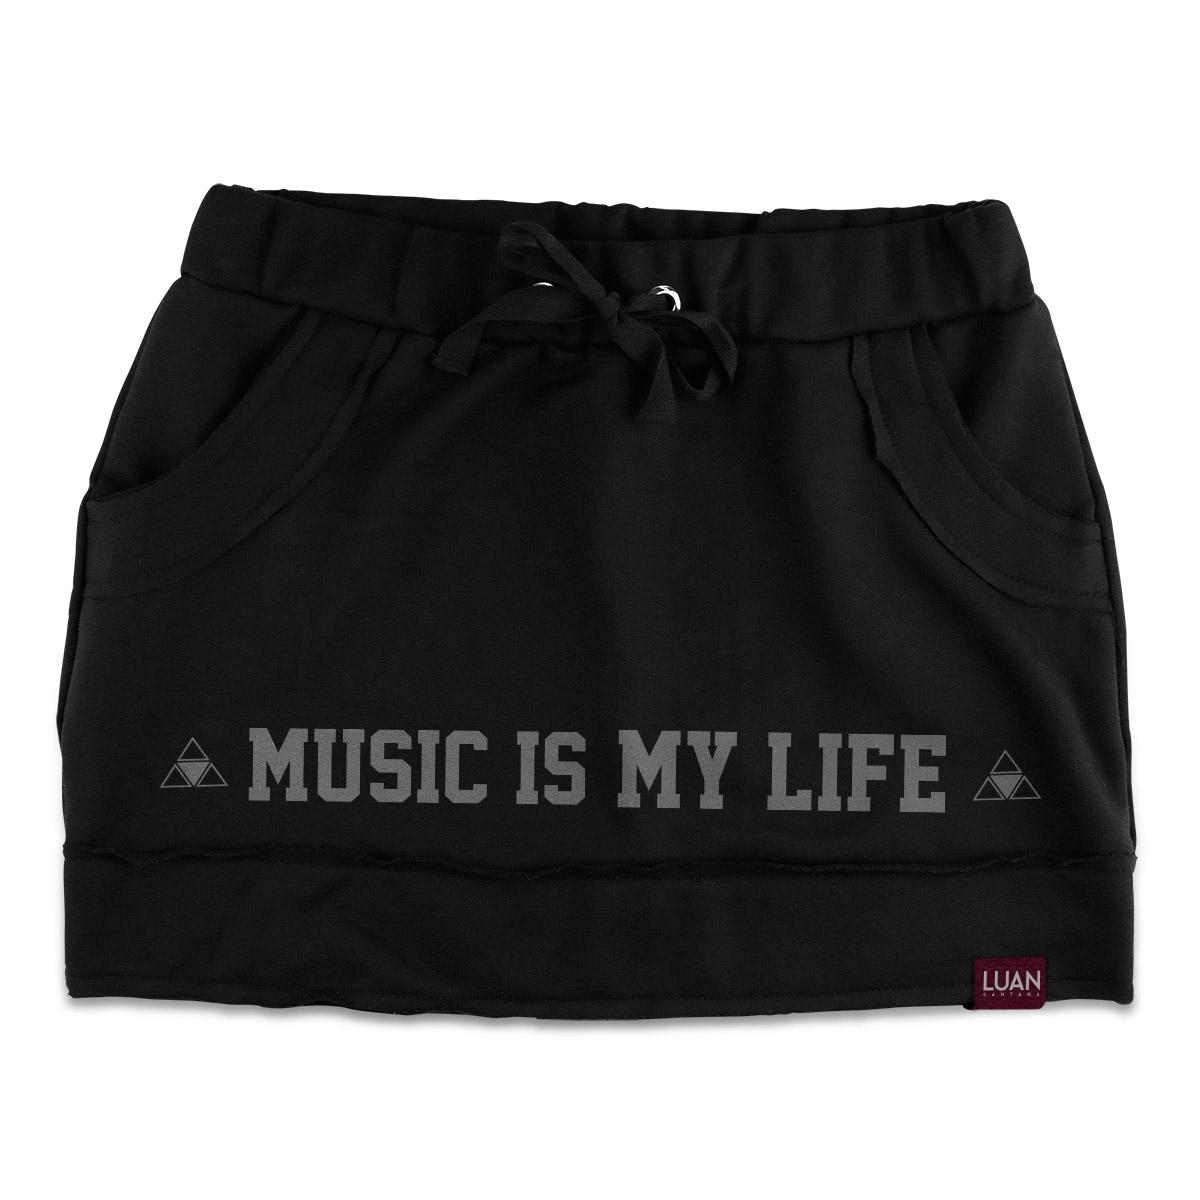 Saia de Moletom Luan Santana Music Is My Life